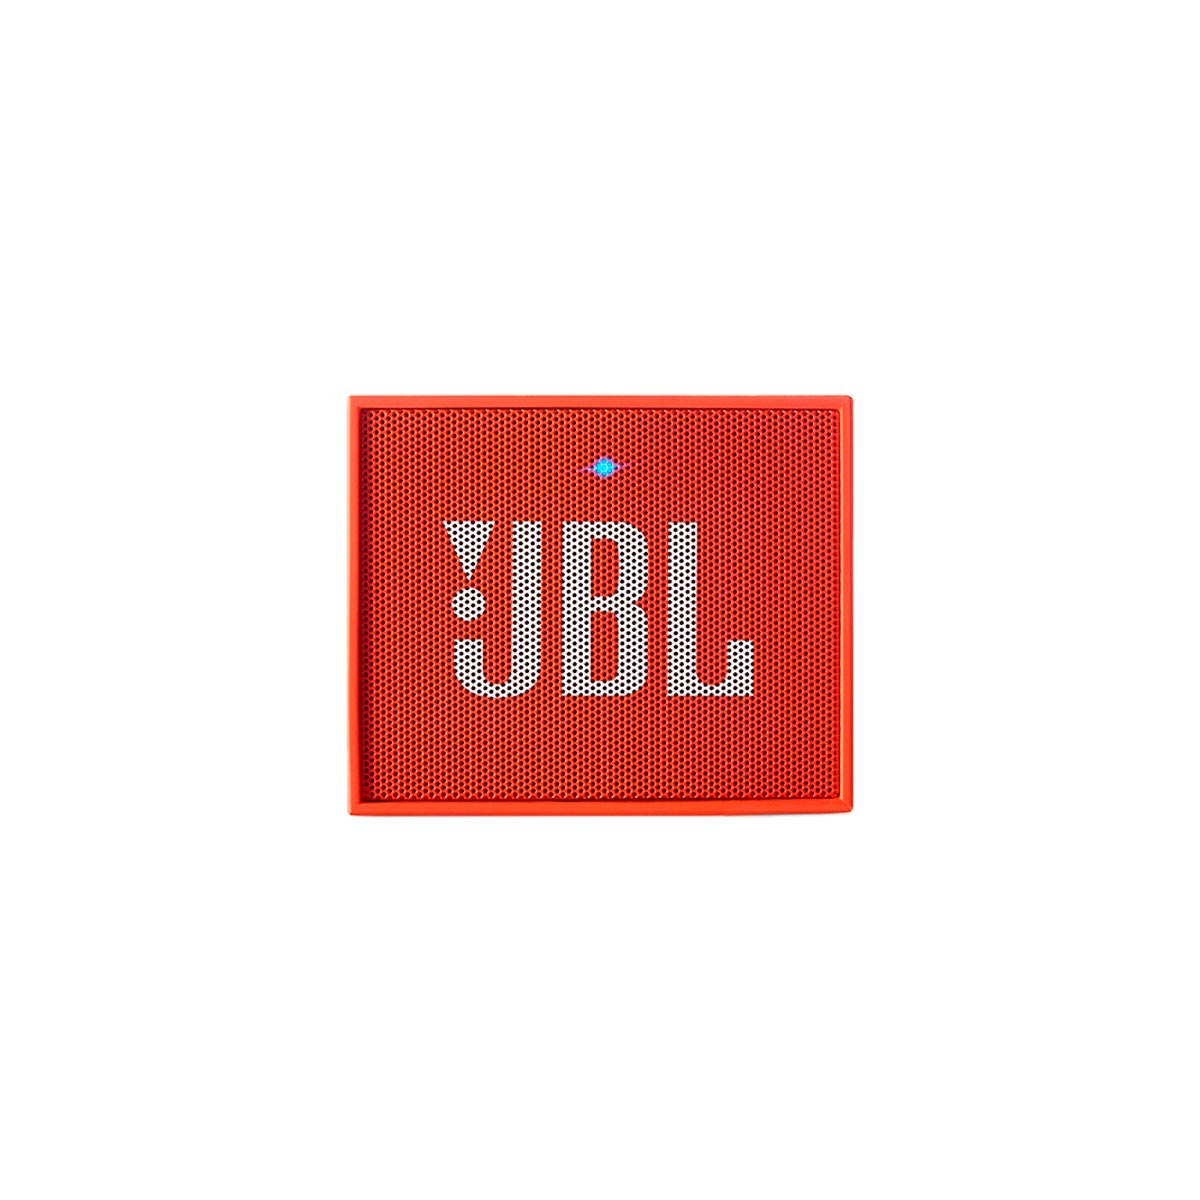 JBLGO - Caixa de Som Portátil 3W c/ Bluetooth JBL GO Laranja - JBL